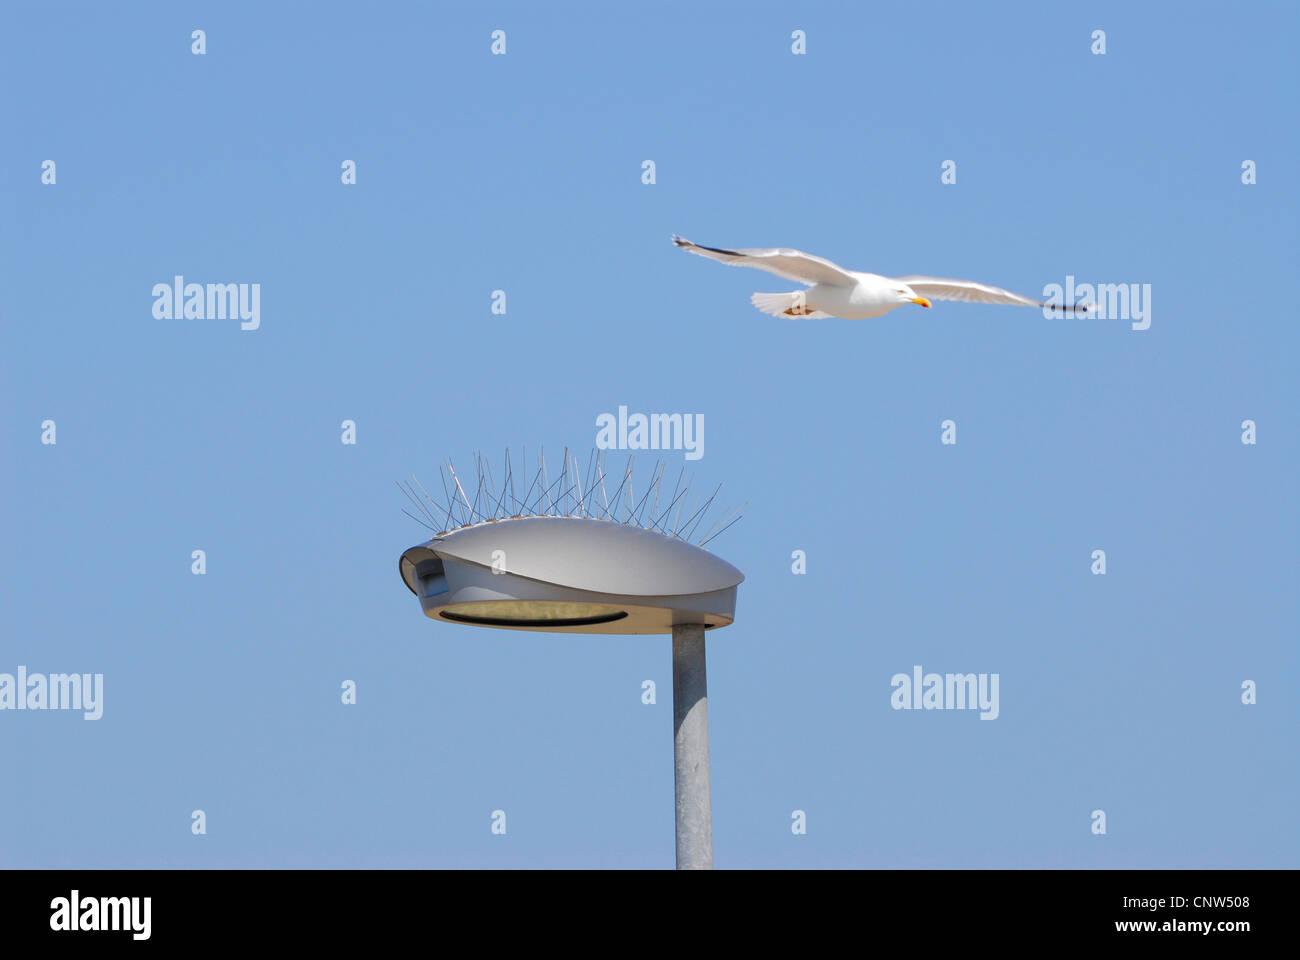 gulls (Larinae), protection for birds on a street latern, Germany, Heligoland - Stock Image